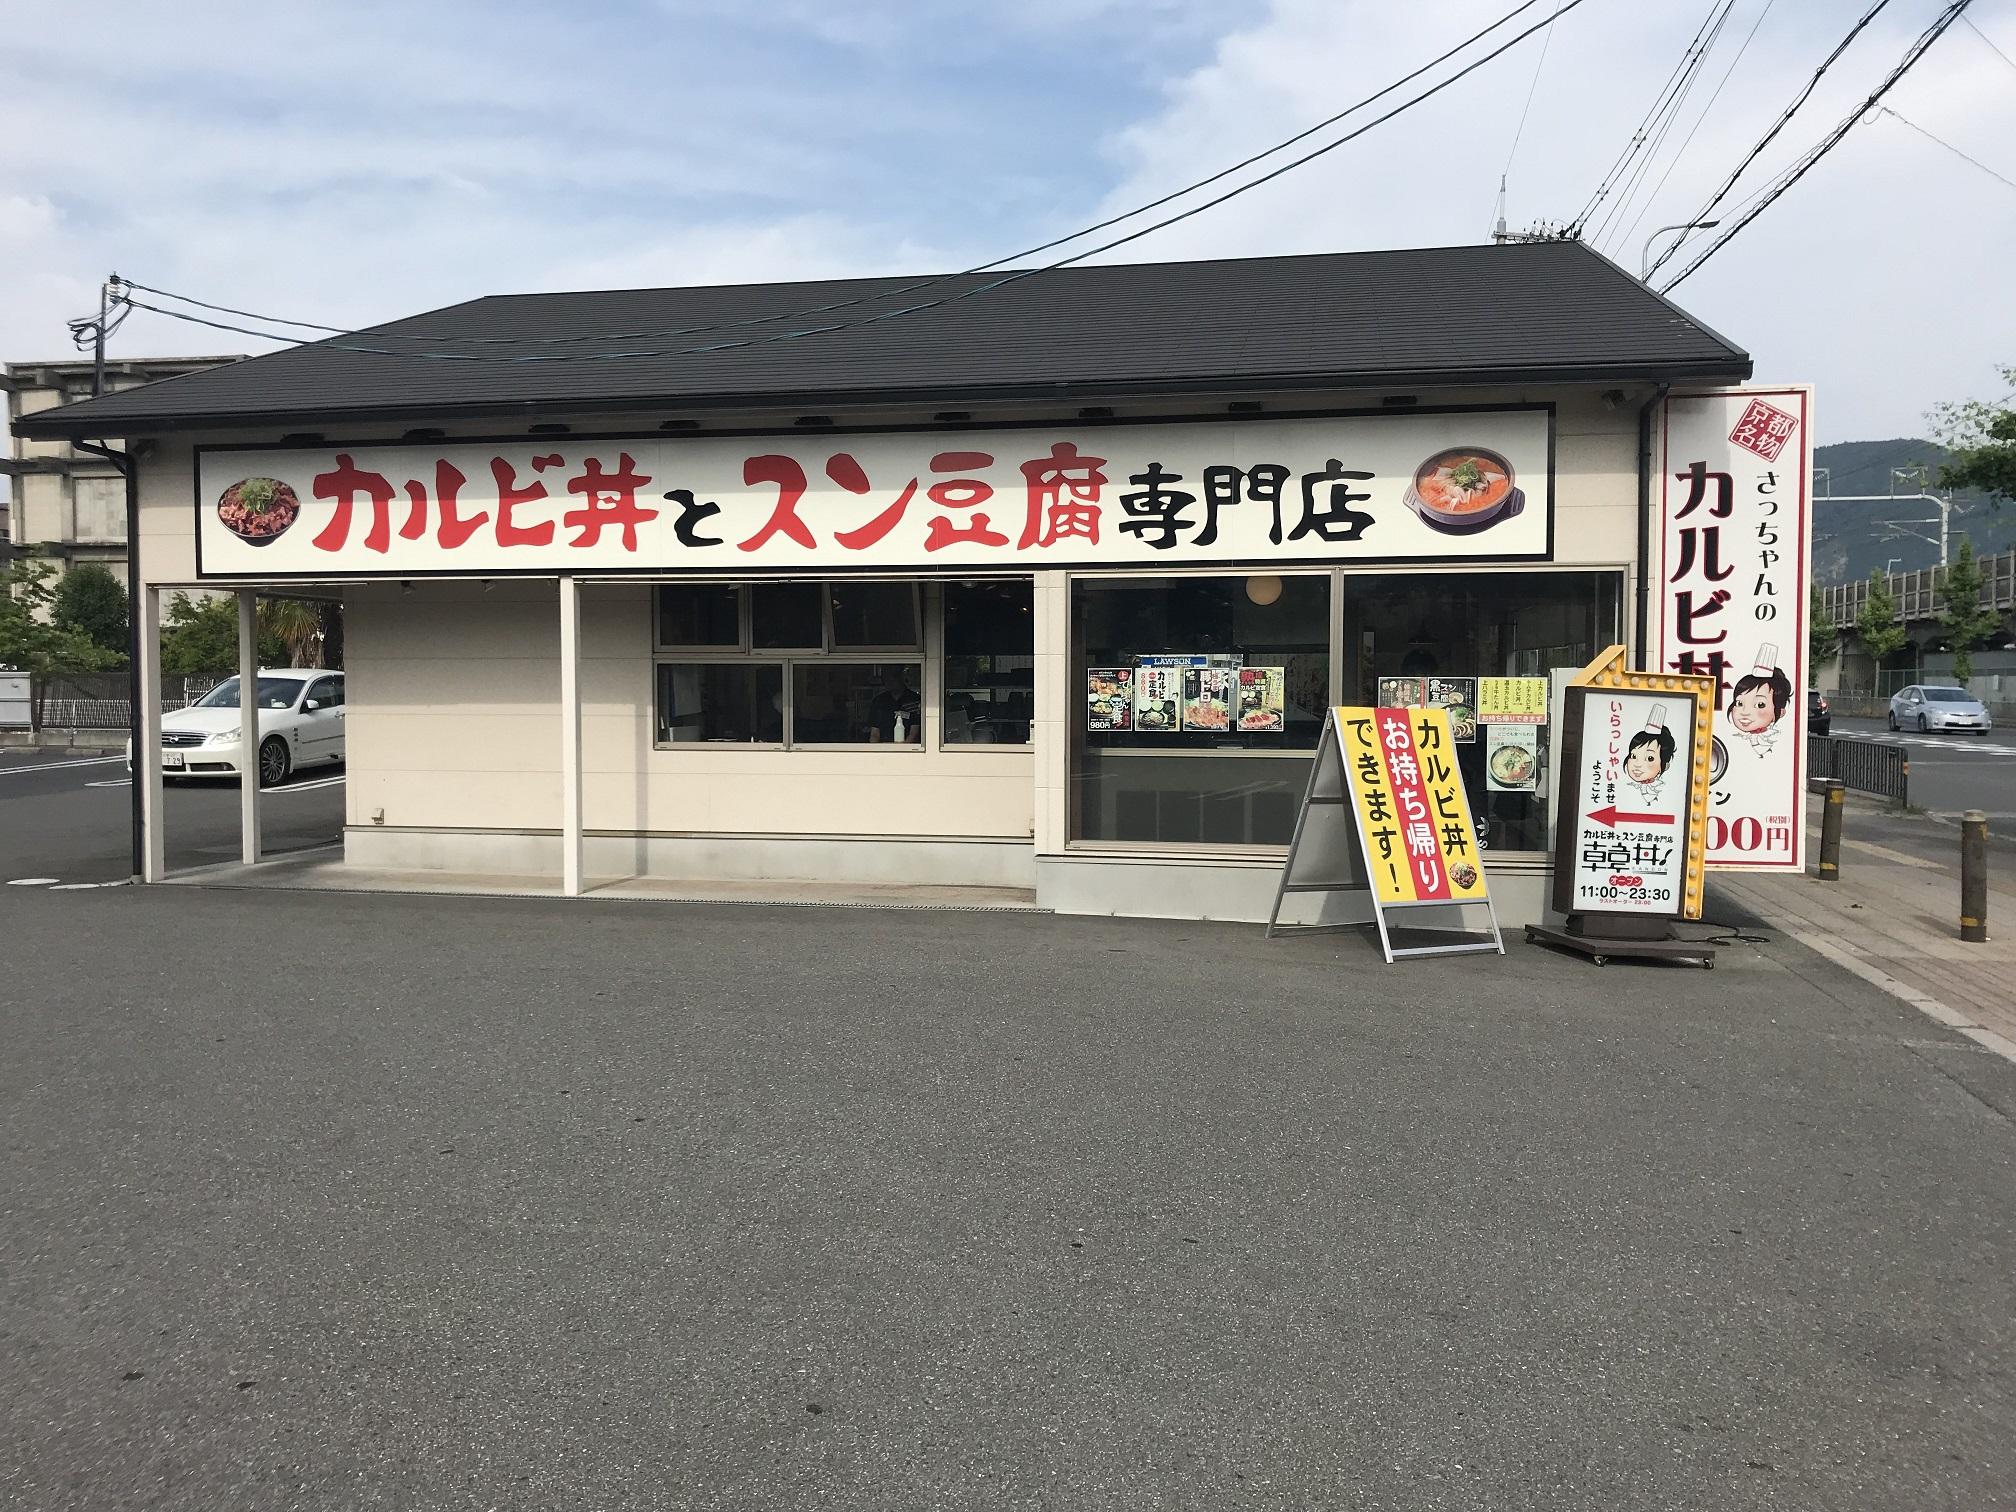 カルビ丼と豆腐専門店韓丼(京都市/韓丼)